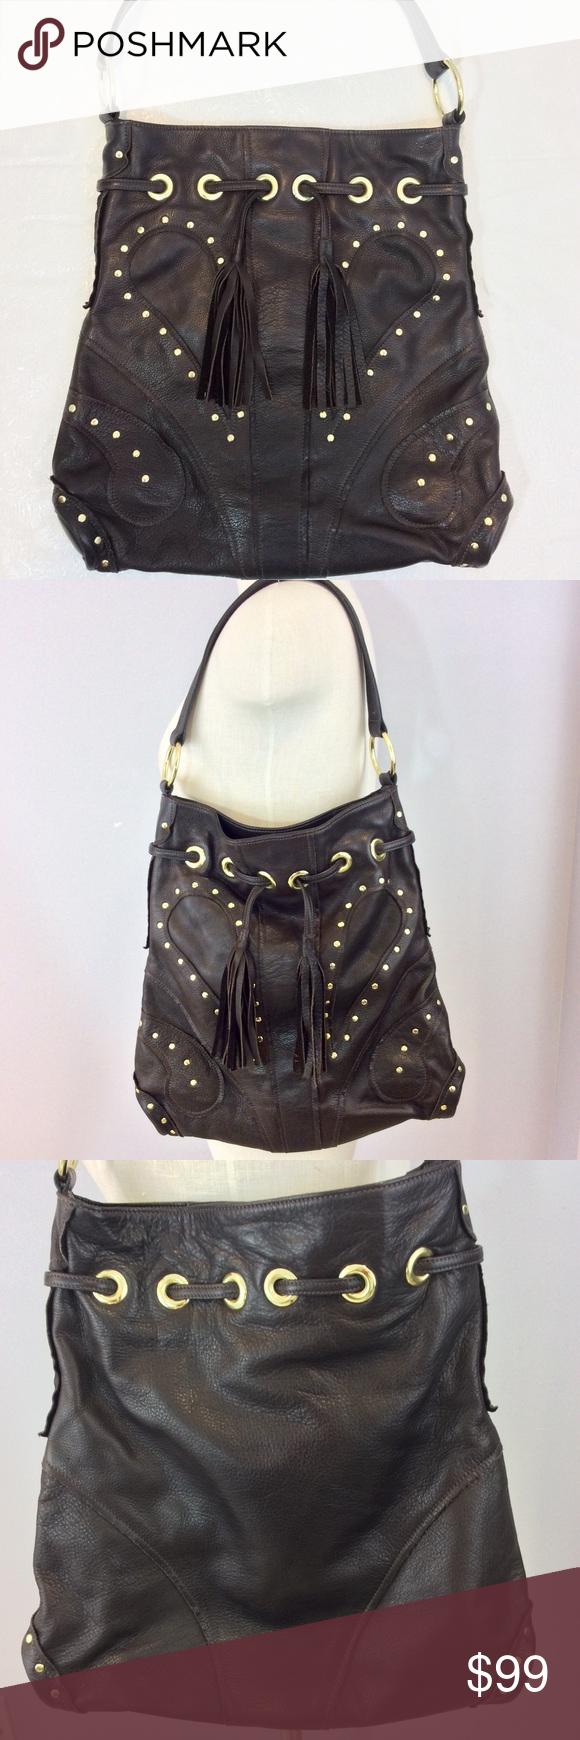 Le Bulga Brown Lamba Leather Hobo Boho Handbag Euc Grommet Studs And Tassel Details